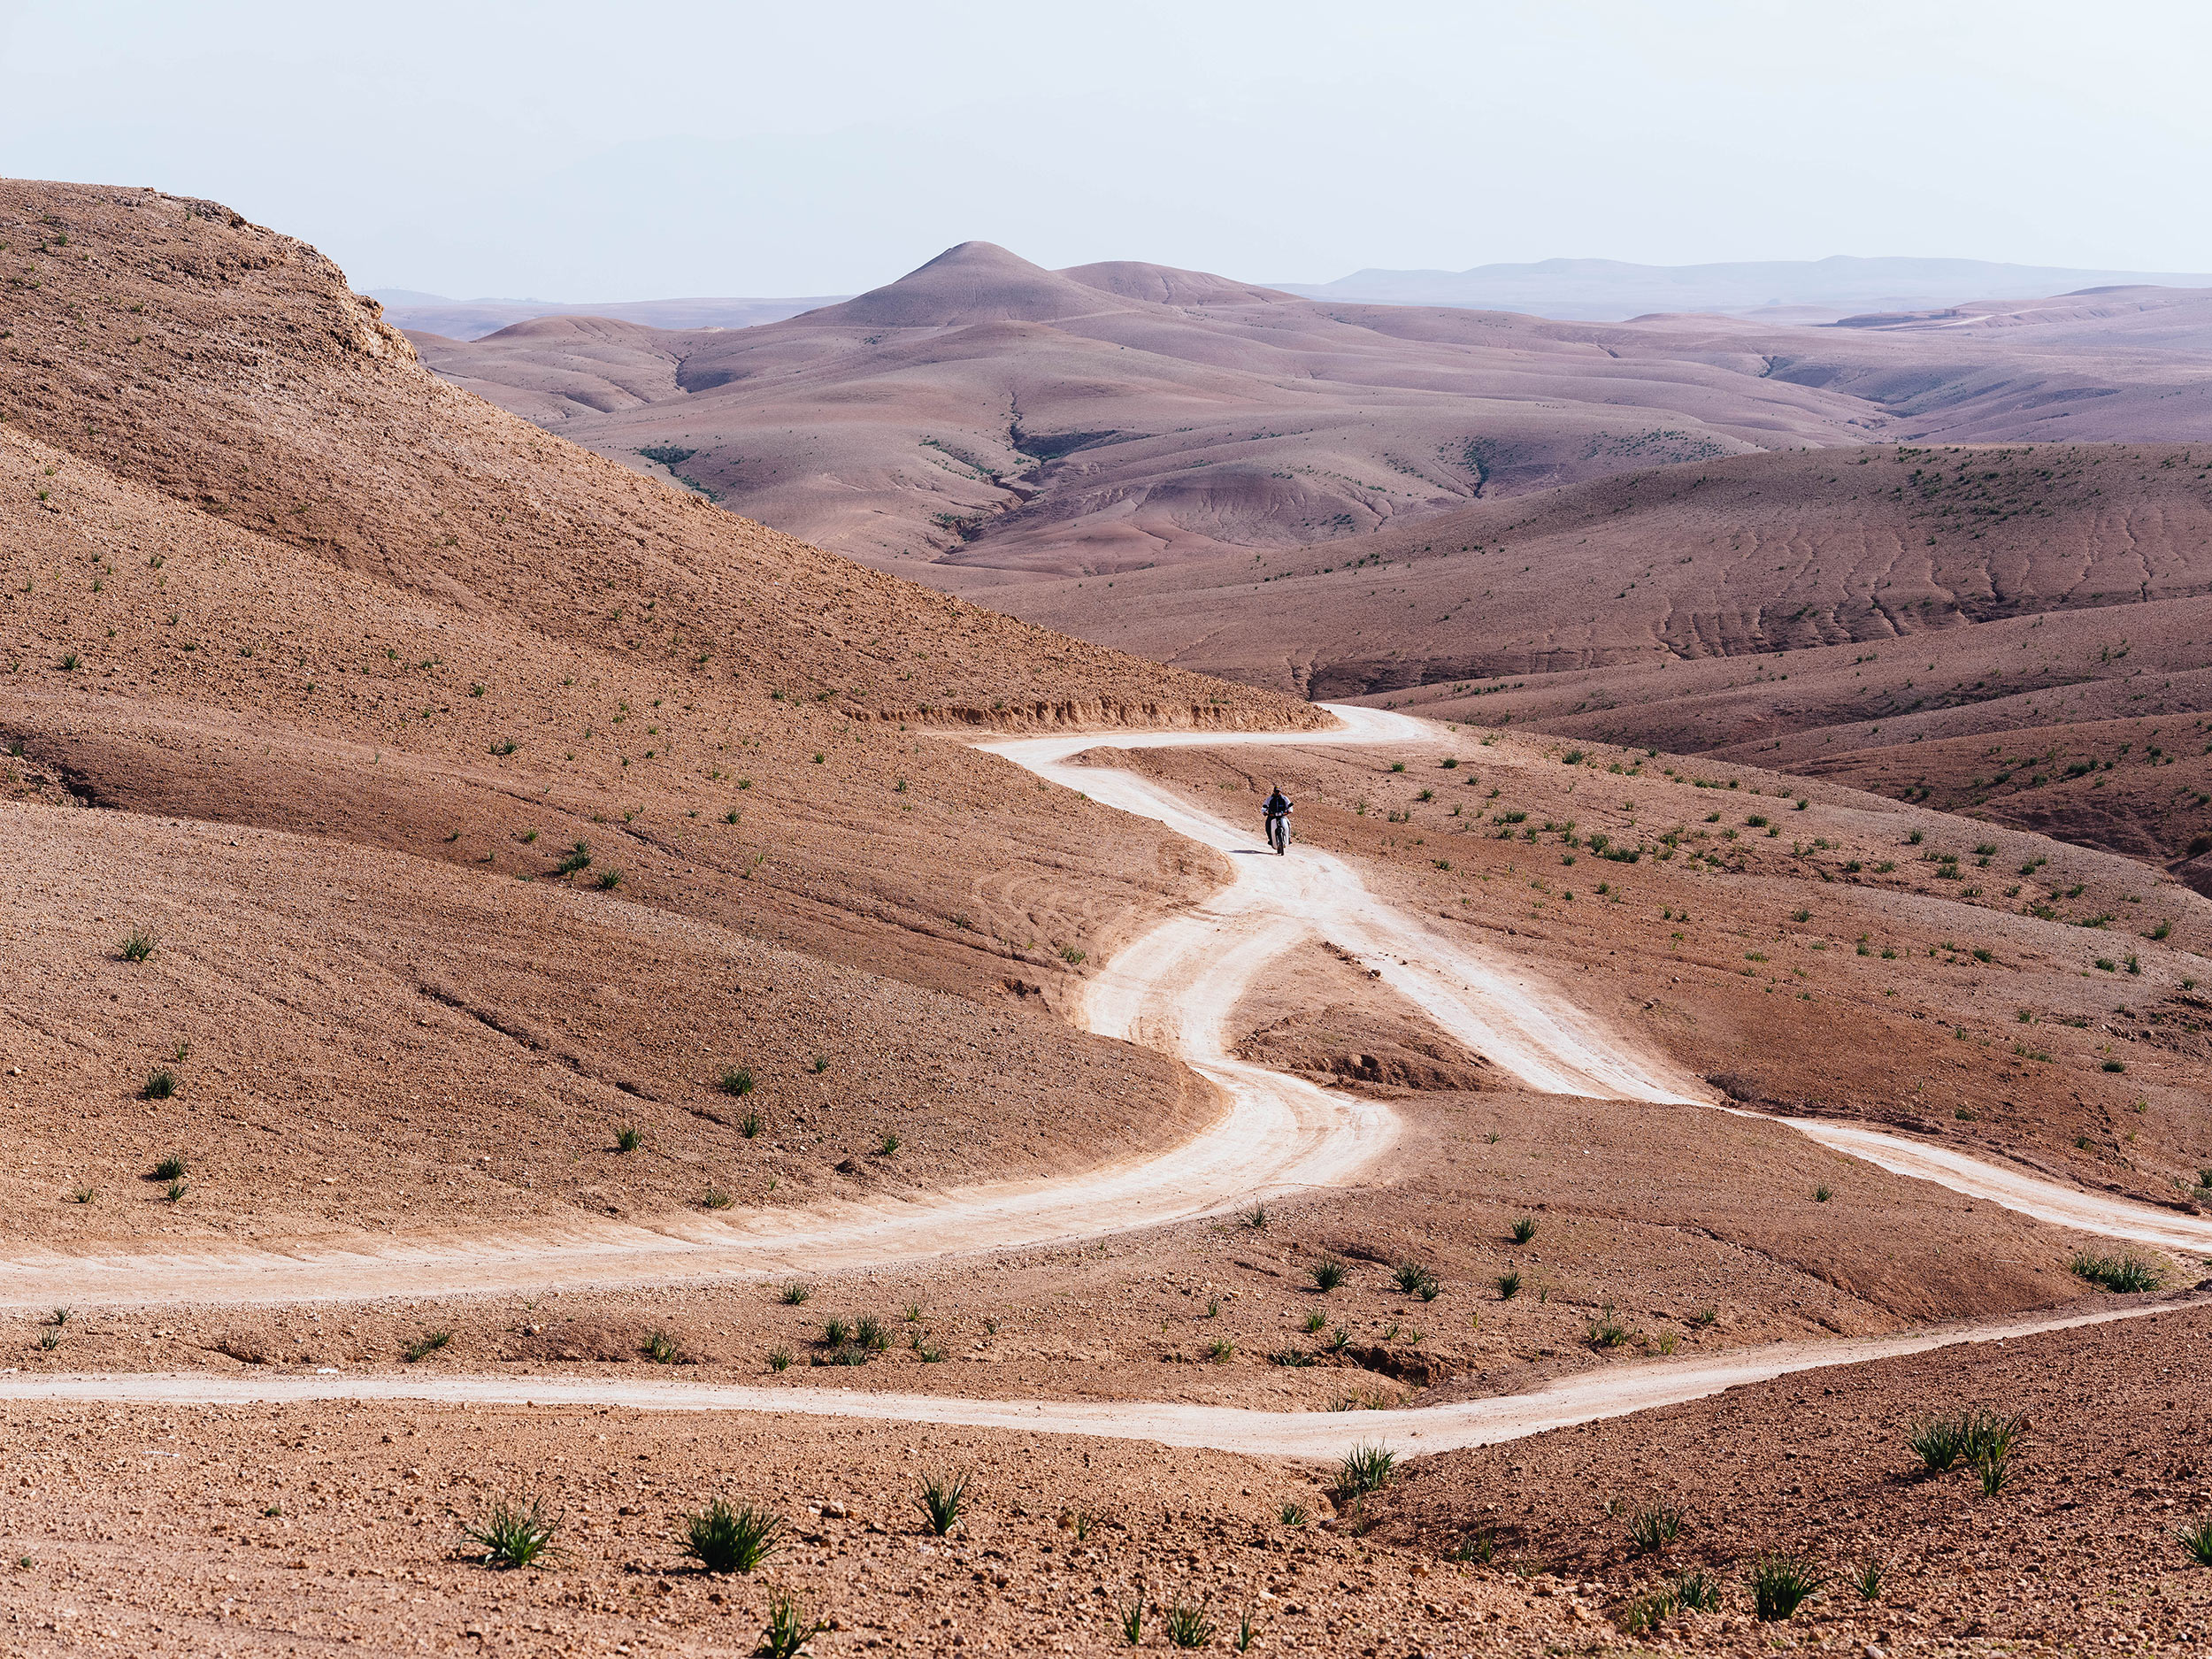 Morocco-08230.jpg